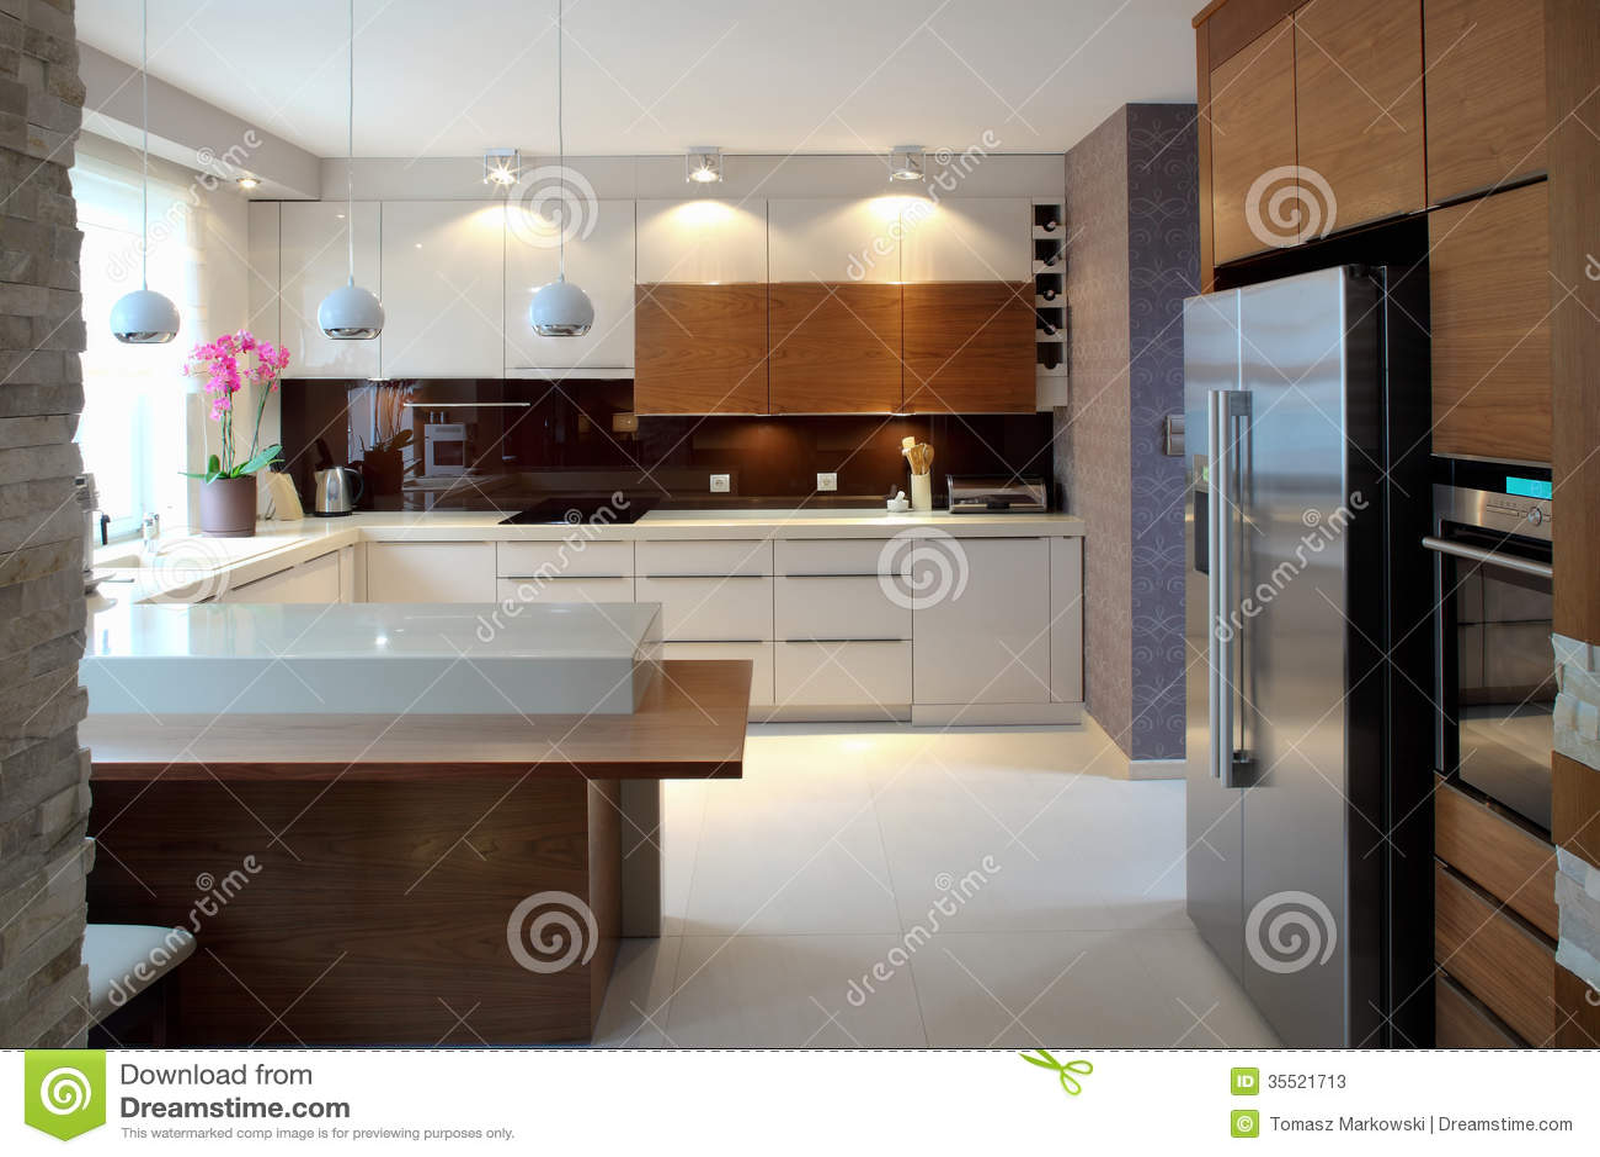 Luxurious Modern Kitchen Stock Photos Image: 35521713 #6B4830 1300 957